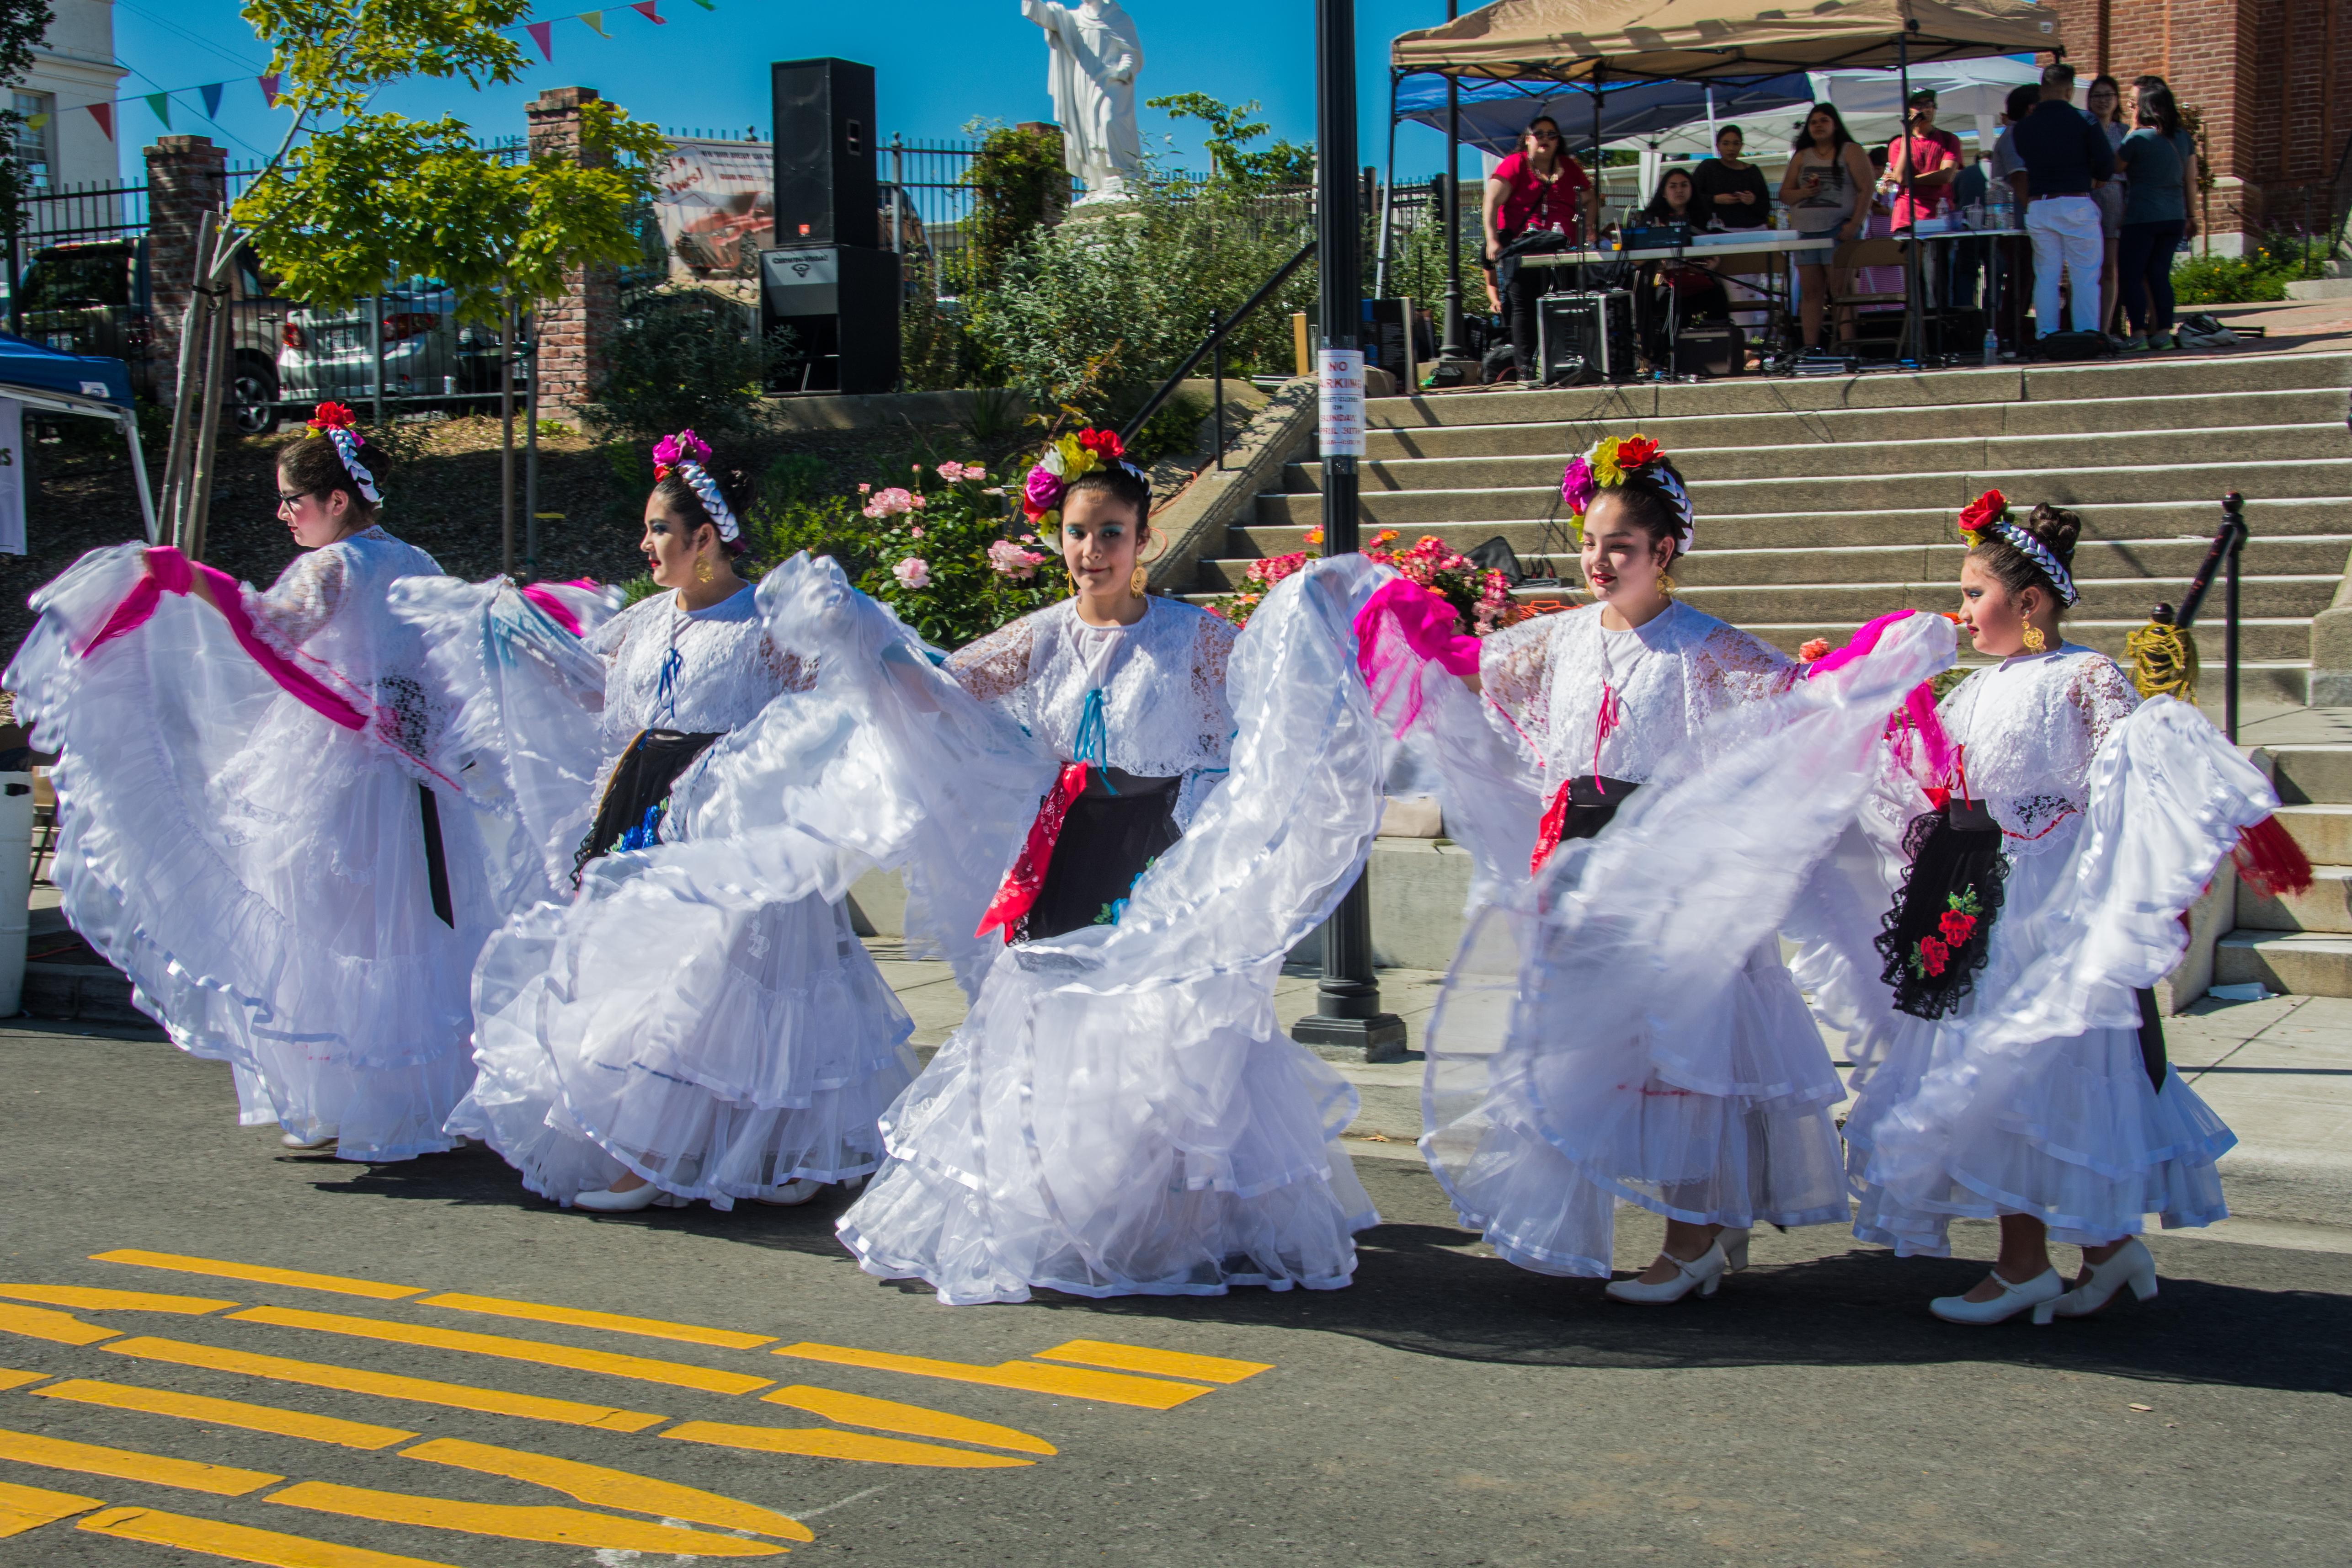 2017 St Vincent Fiesta (146 of 165)